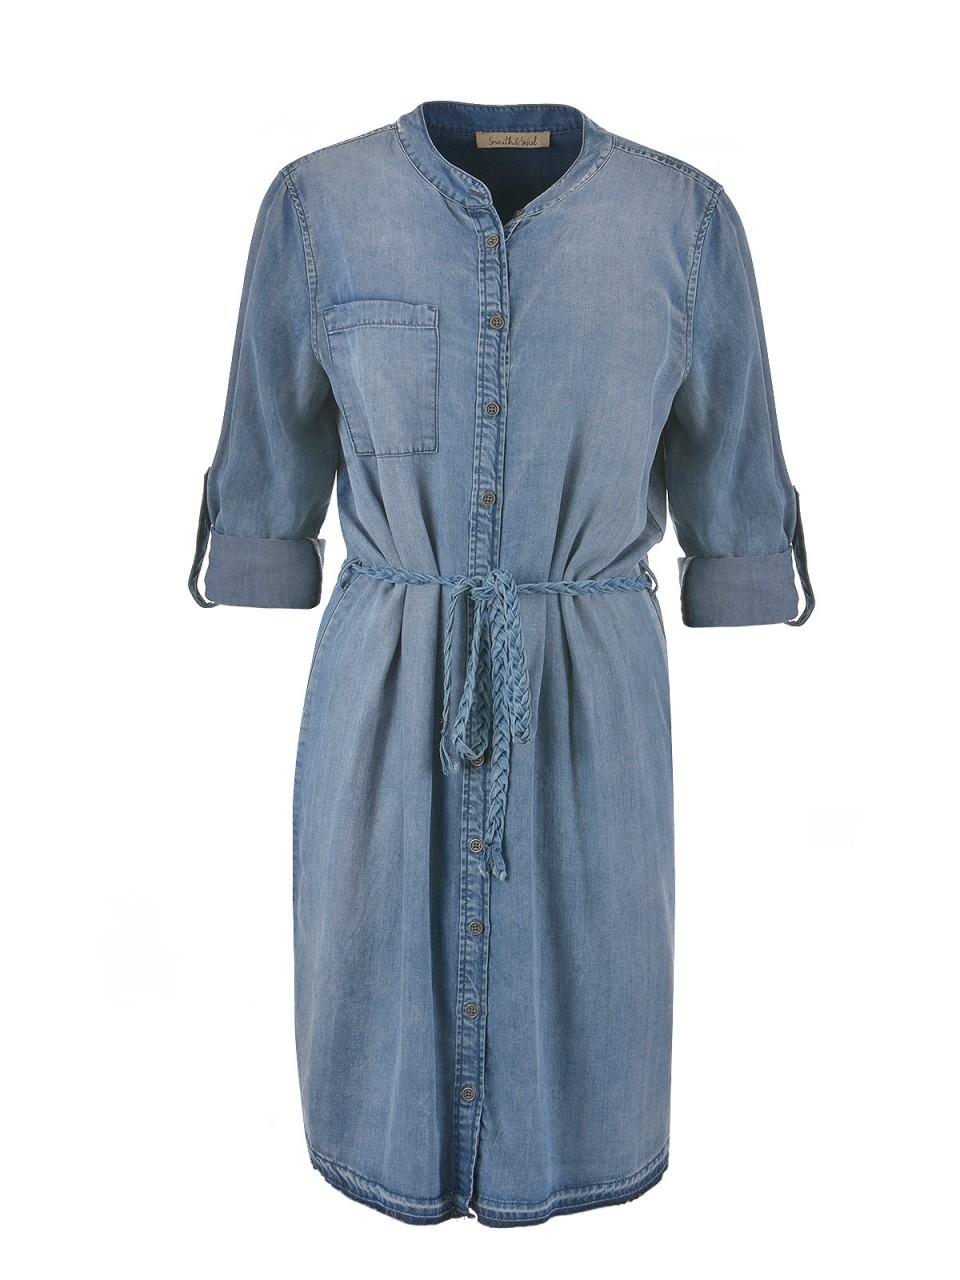 smith-amp-soul-damen-jeanskleid-blau, 64.97 EUR @ designermode-com-mode